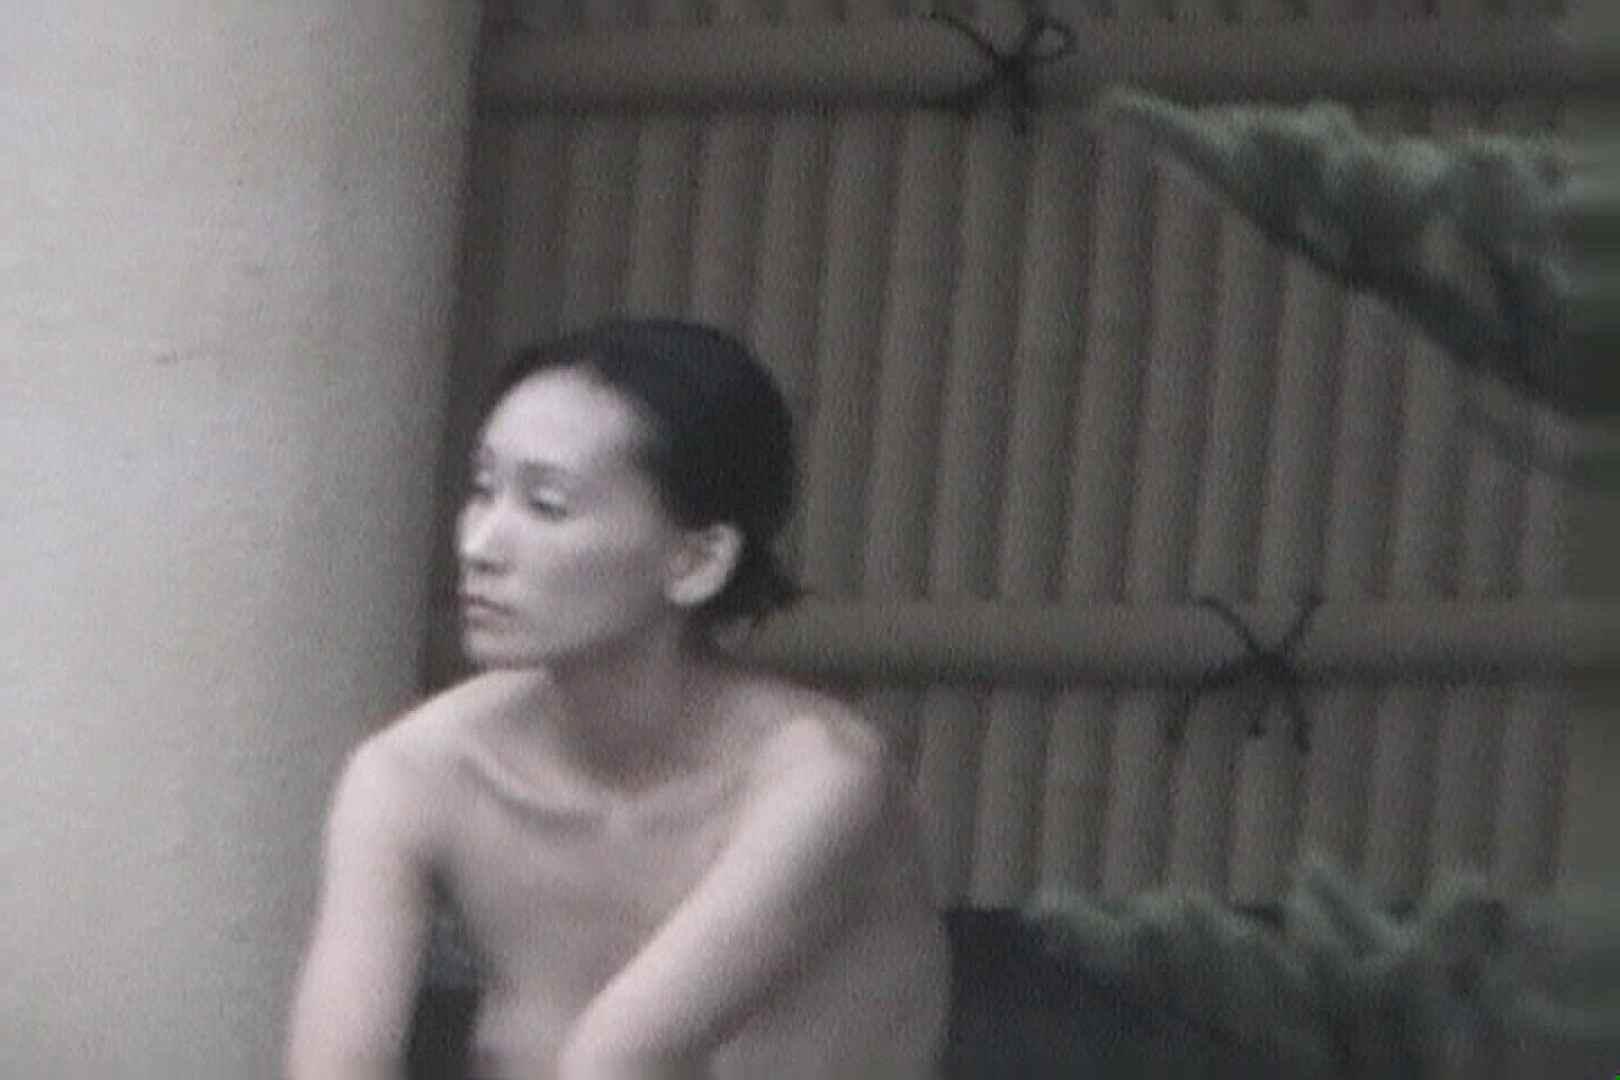 Aquaな露天風呂Vol.557 OLのエロ生活 | 露天風呂  34連発 25